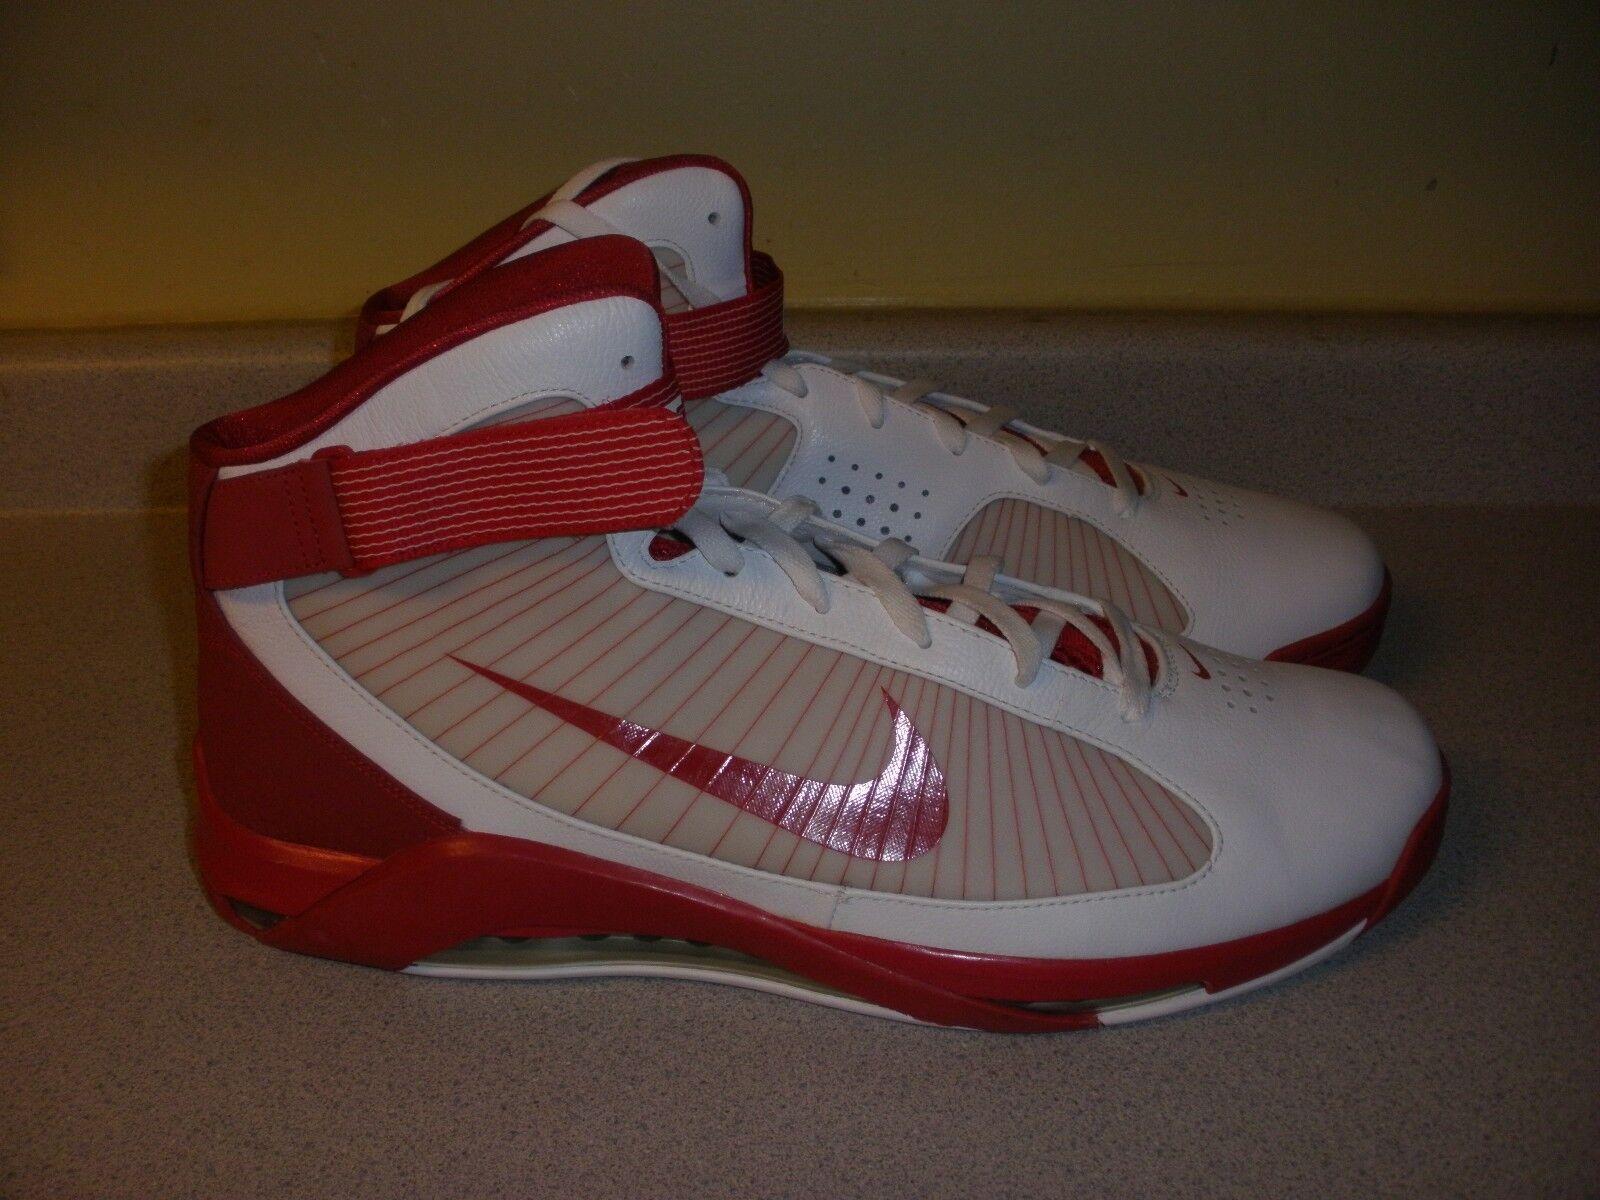 Nike air max Uomo hypermax flywire dimensioni 17 rosso - bianco